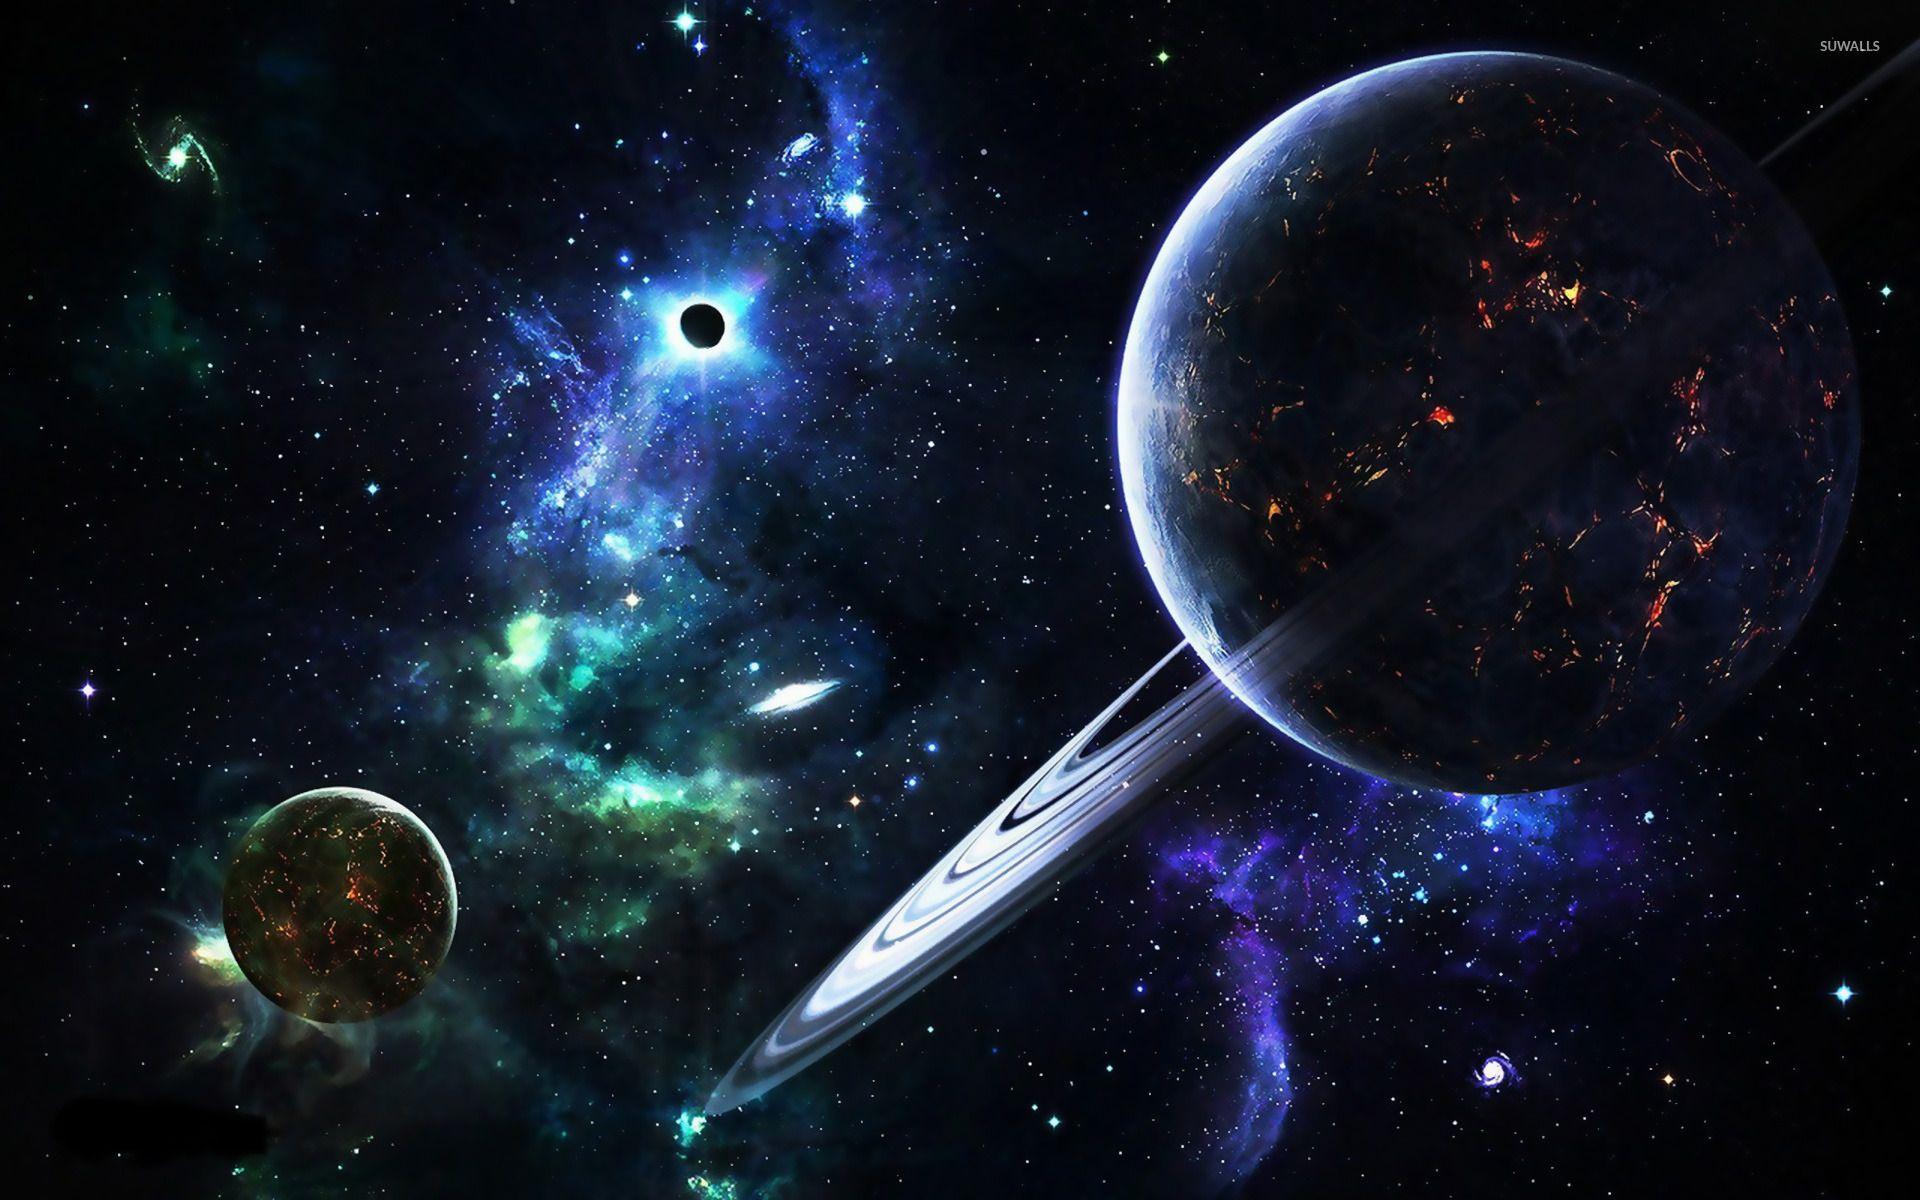 planets and galaxies wallpaper - fantasy wallpapers - #10872